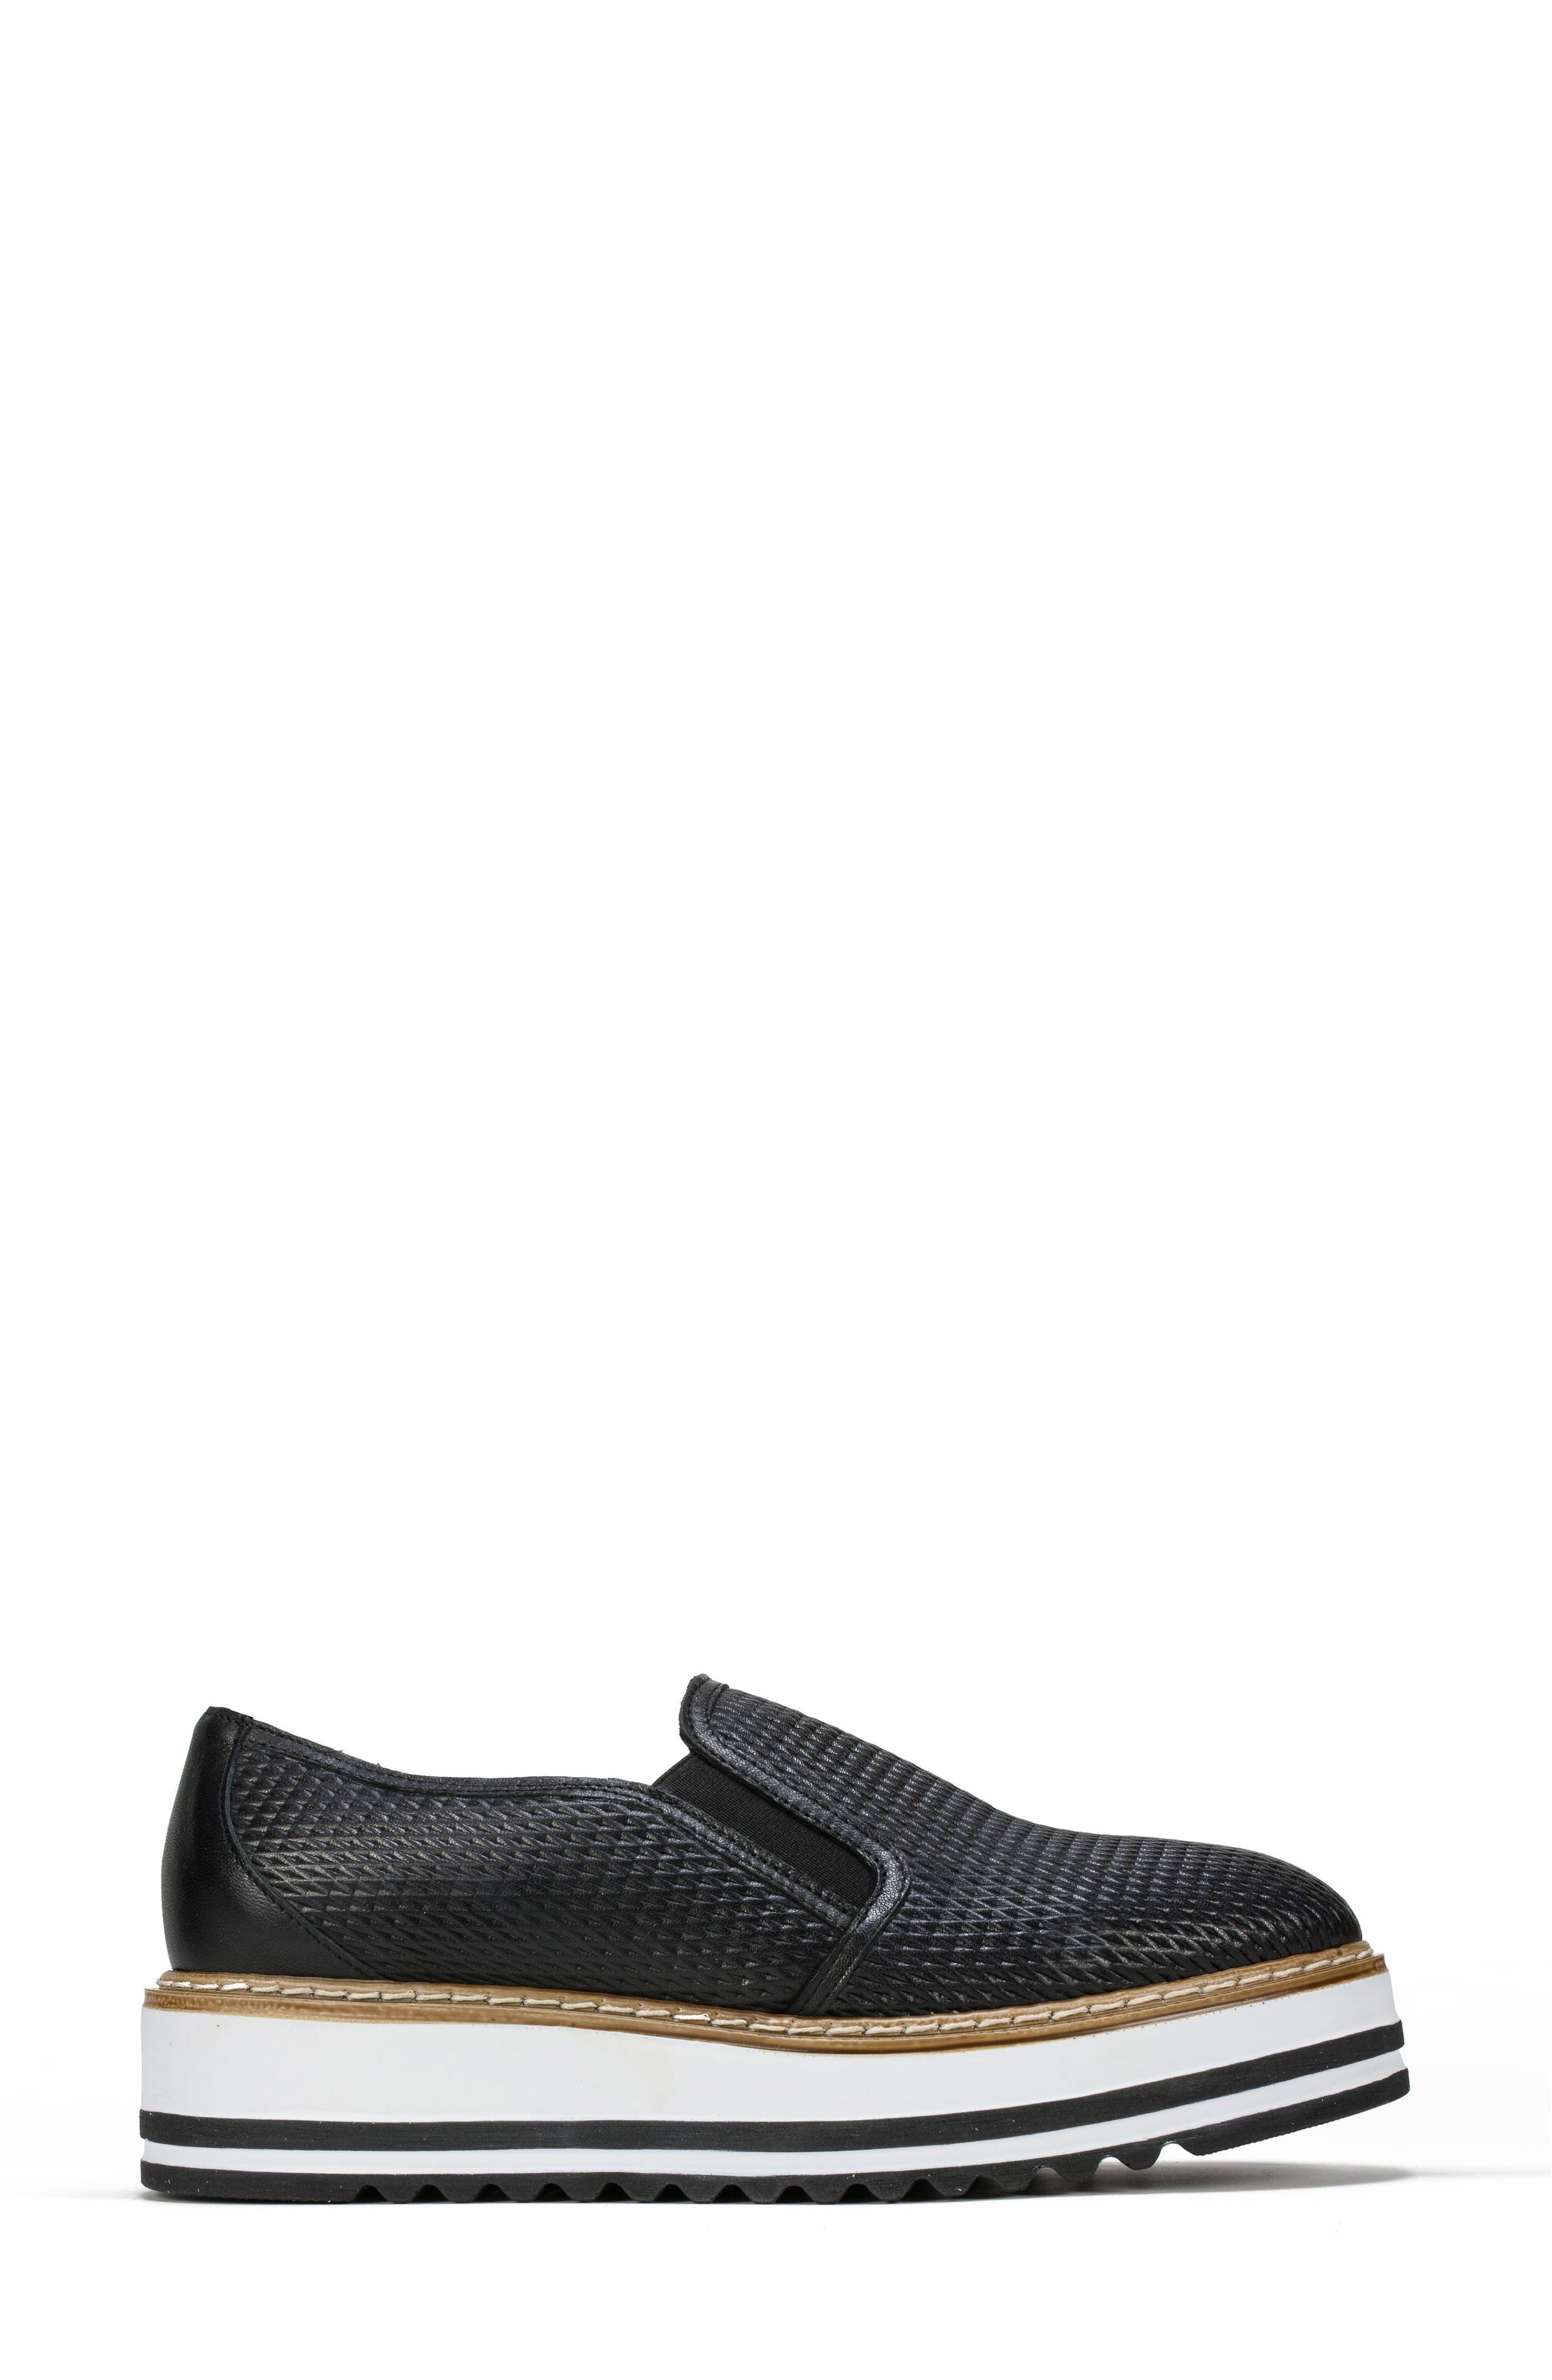 Belton Platform Slip-On,                             Alternate thumbnail 3, color,                             Black Textured Leather